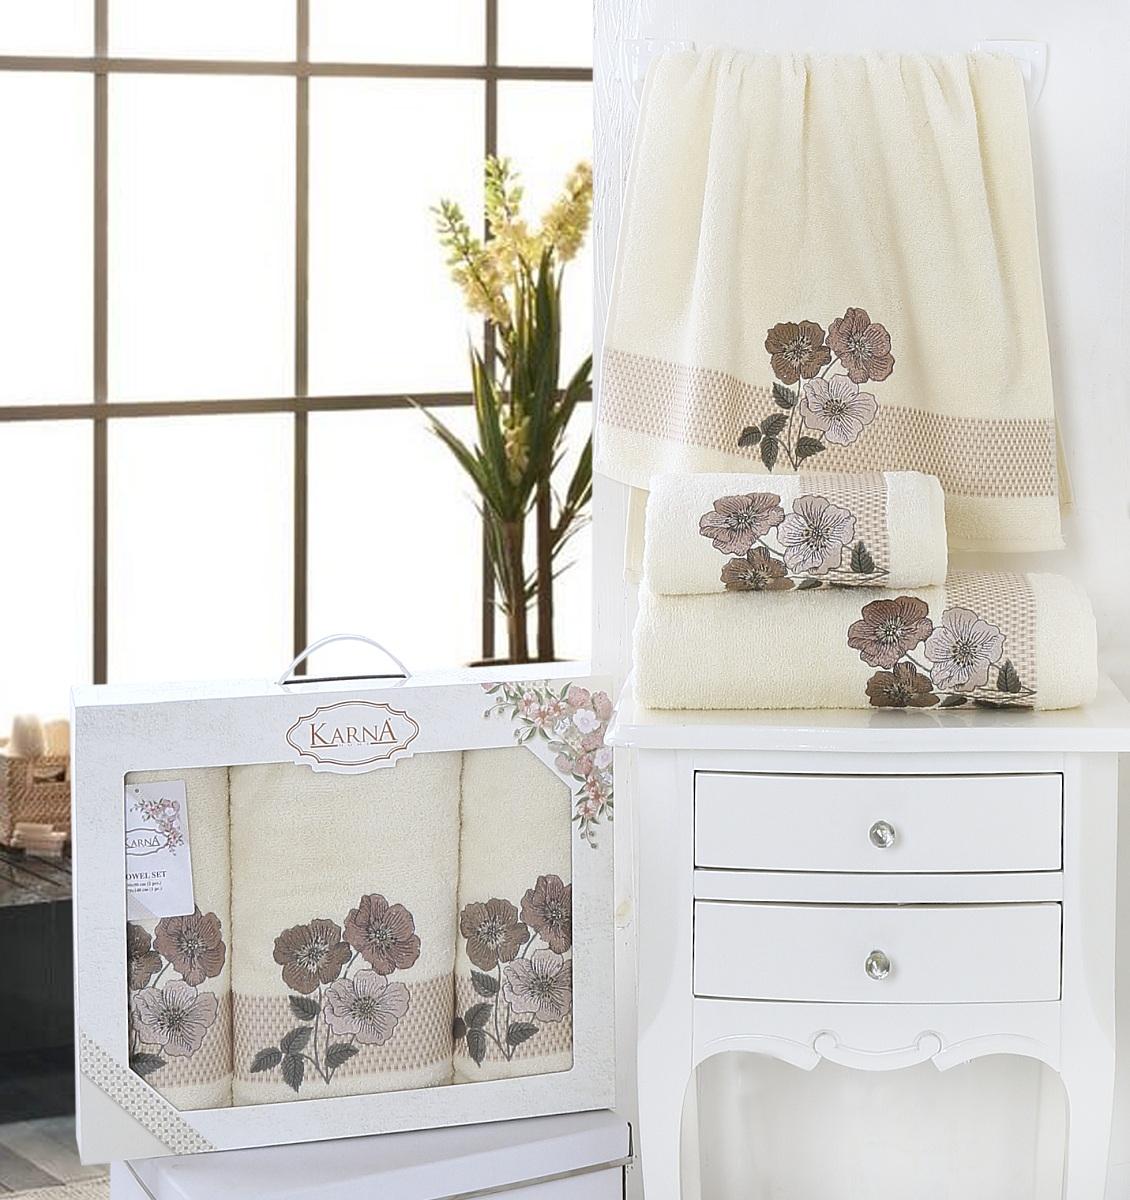 Полотенца Karna Полотенце Sandy Цвет: Кремовый (Набор) полотенца karna полотенце petek цвет кремовый синий набор